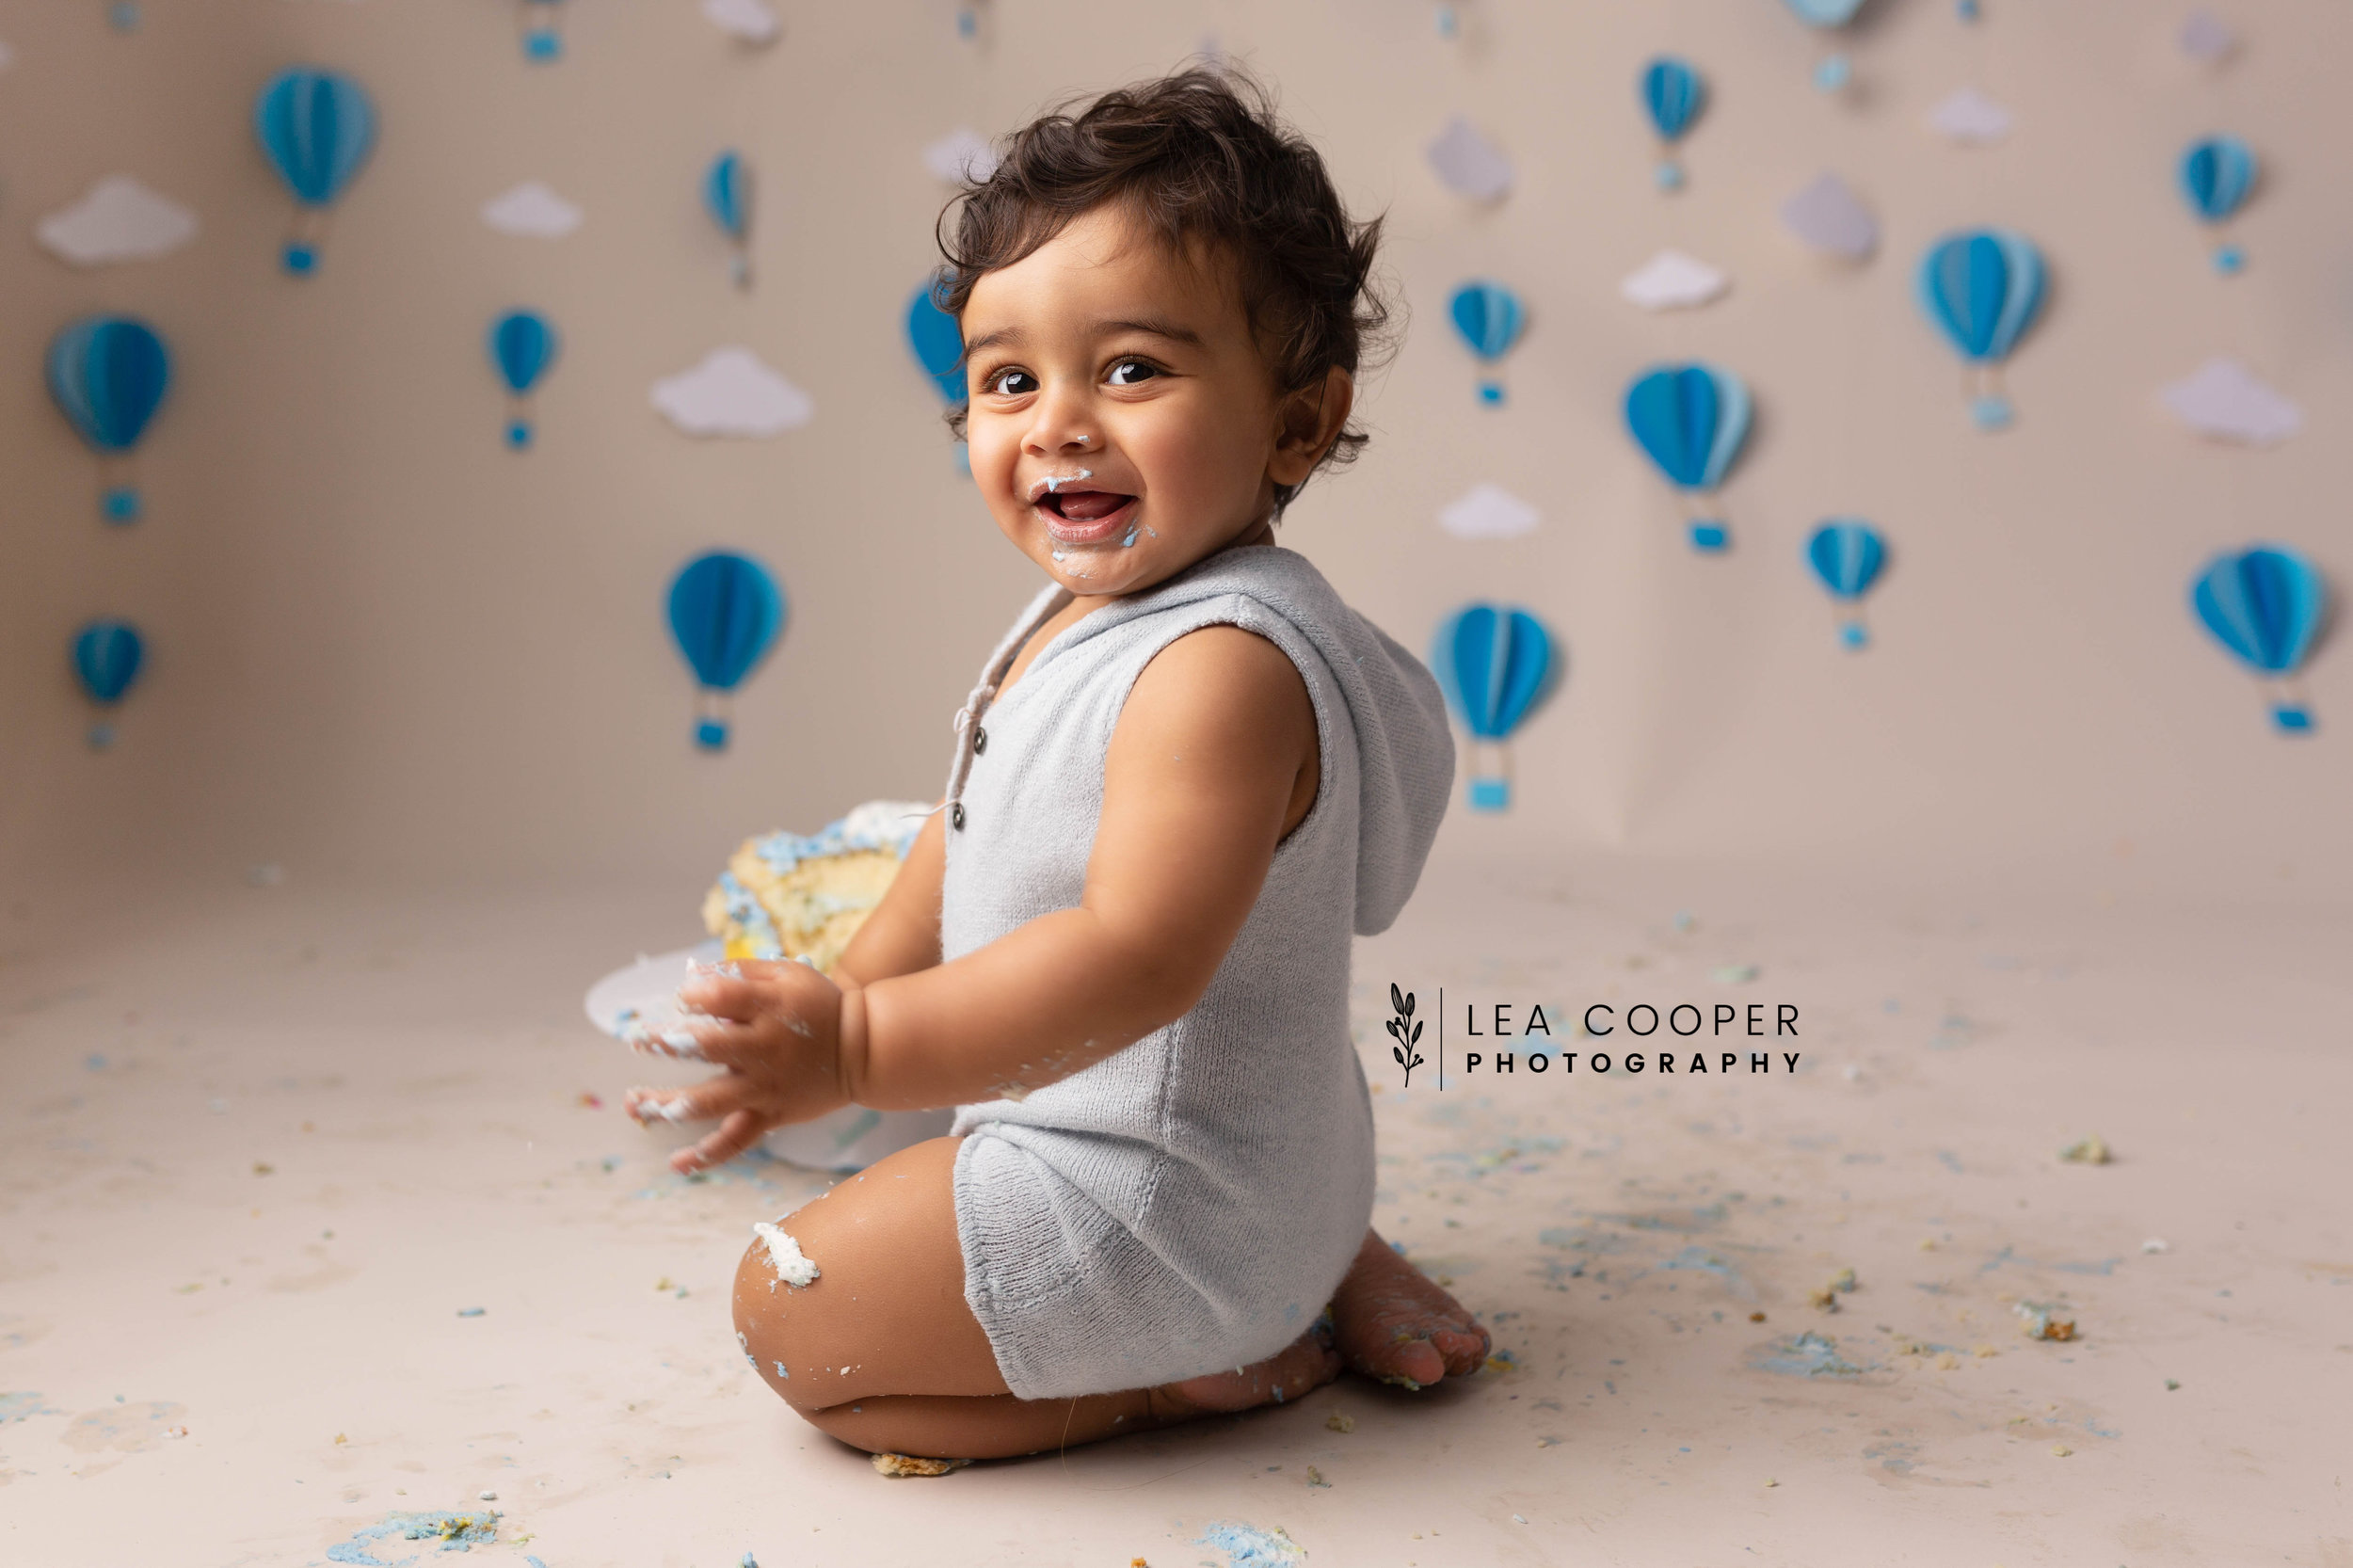 LEA-COOPER-PHOTOGRAPHY-CAKE-SMASH-PHOTOGRAPHER-WILLENALL-WOLVERHAMPTON-CHILD-PHOTOSHOOT-1ST—BIRTHDAY-PICTURES-WEDNESBURY-WALSALL-DUDLEY-WEST-MIDLANDS-UK-27.JPG